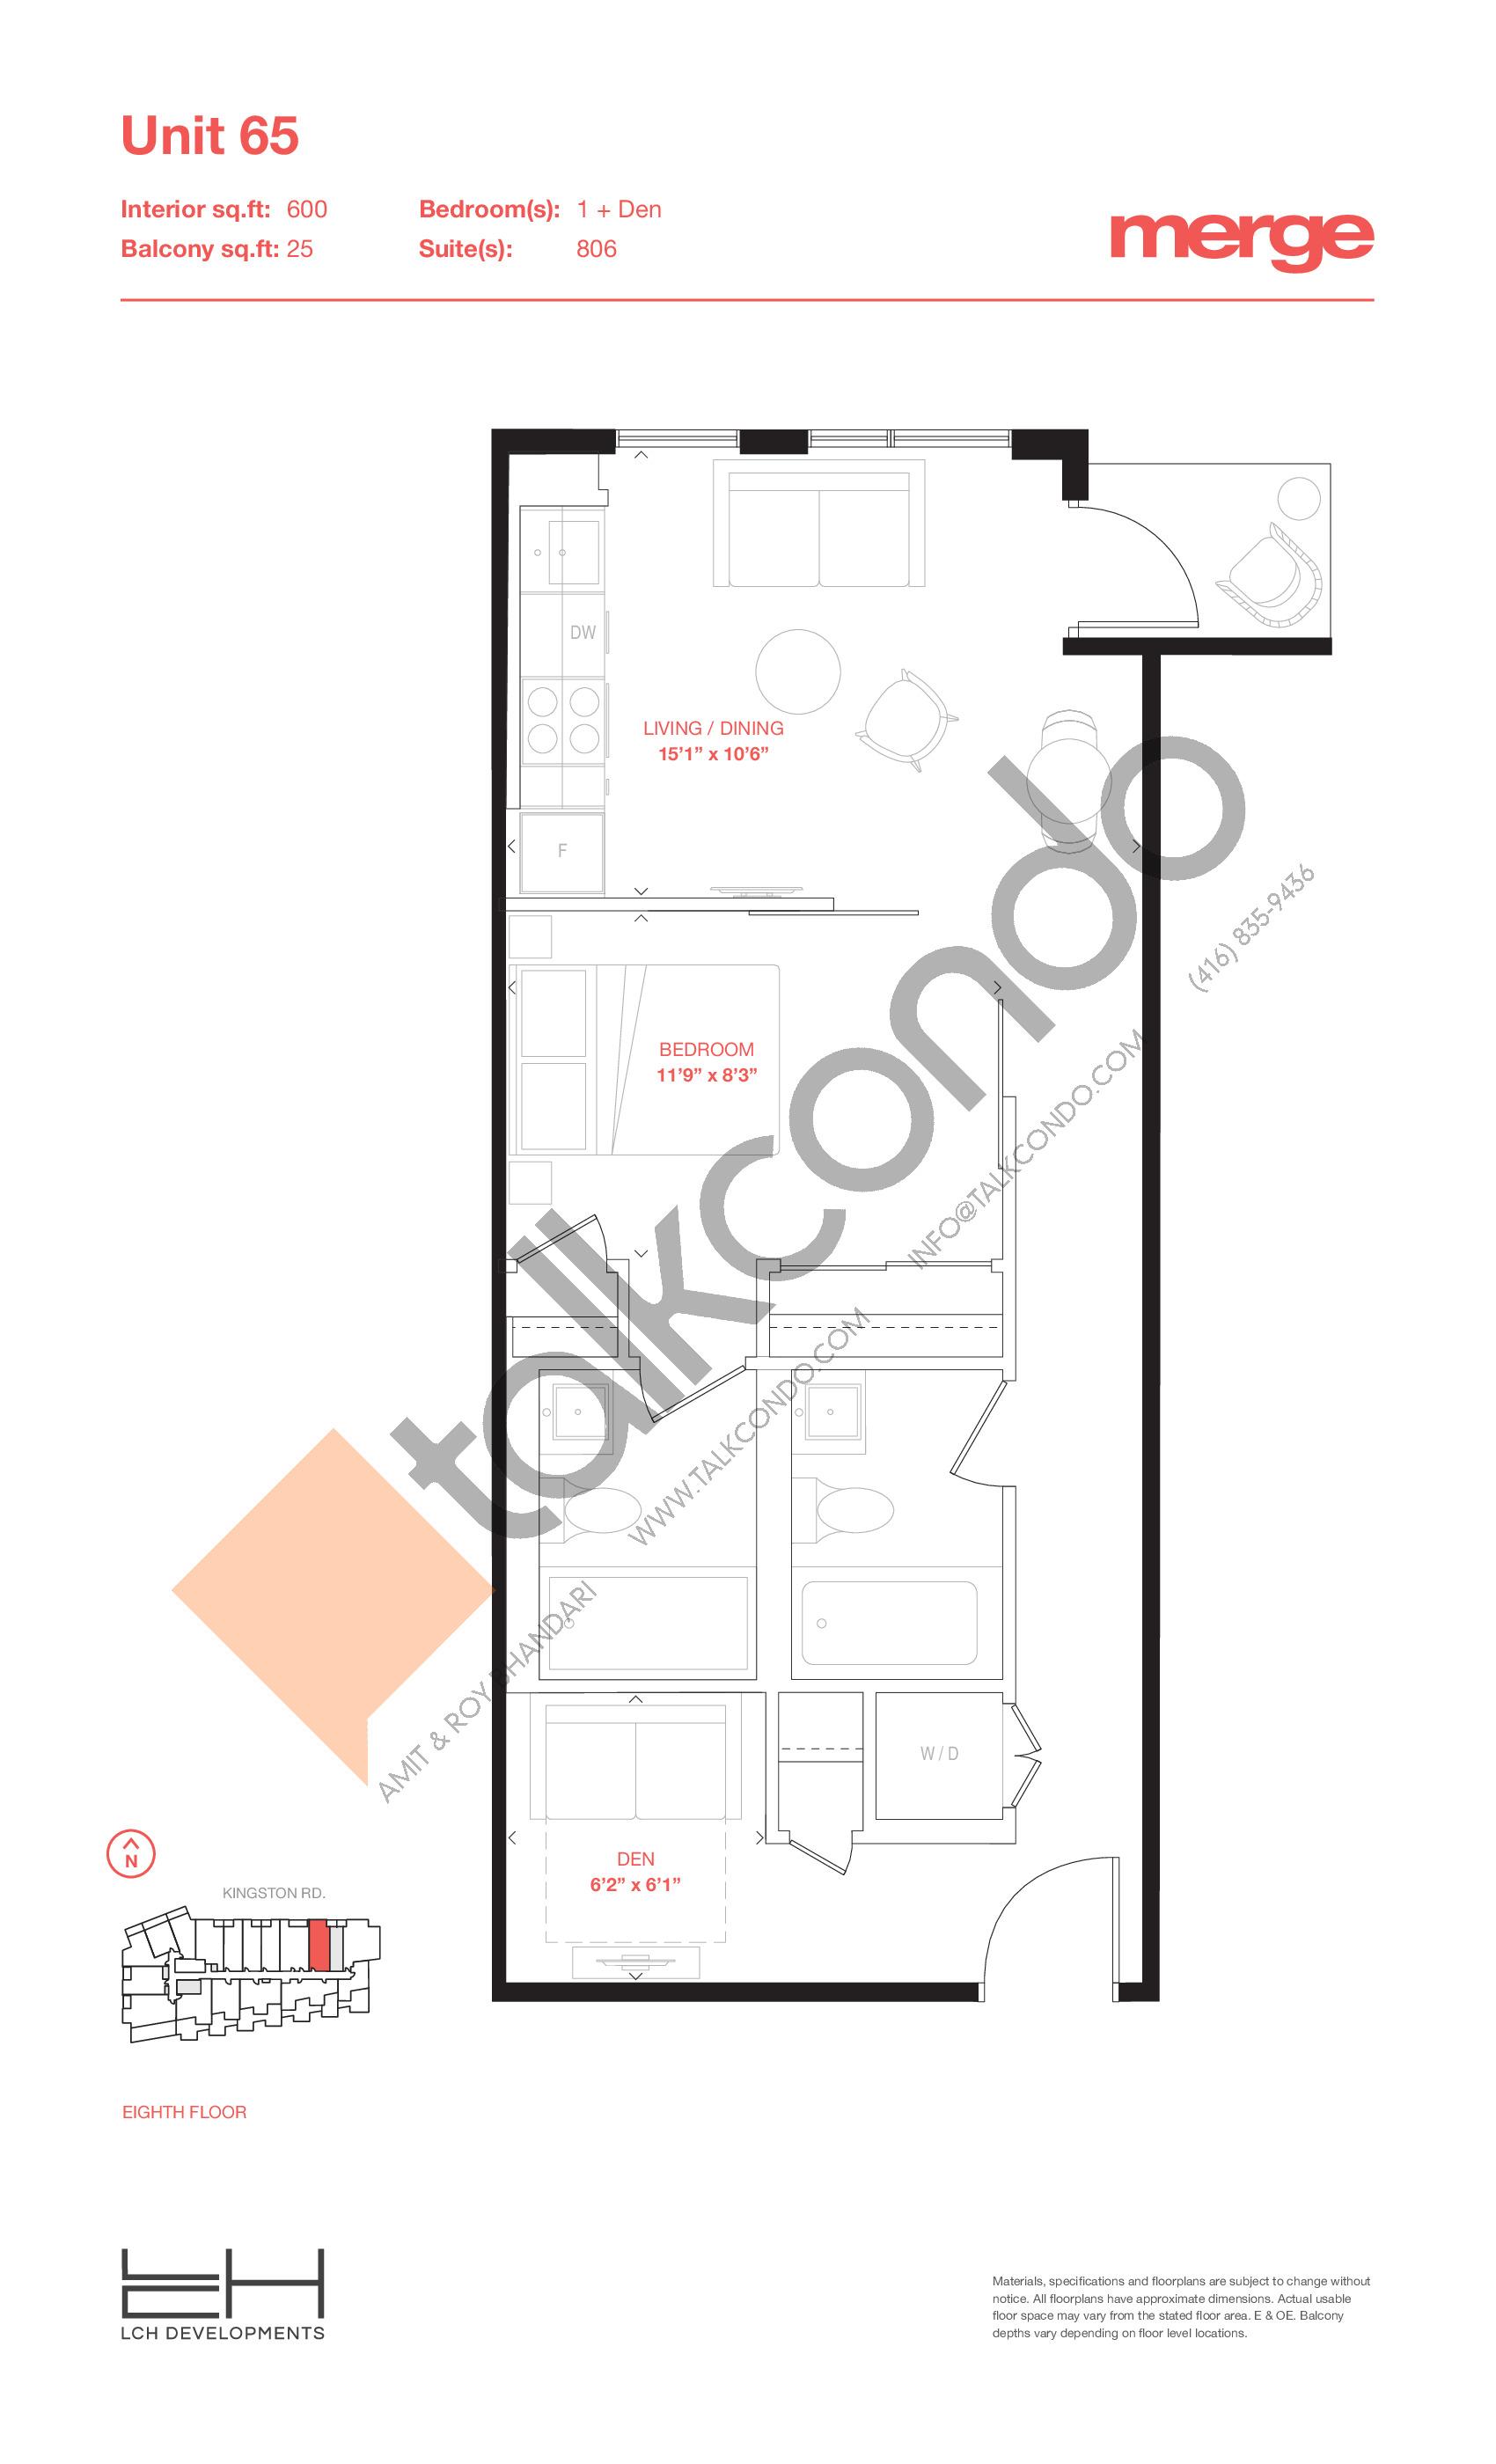 Unit 65 - Tower Floor Plan at Merge Condos - 600 sq.ft